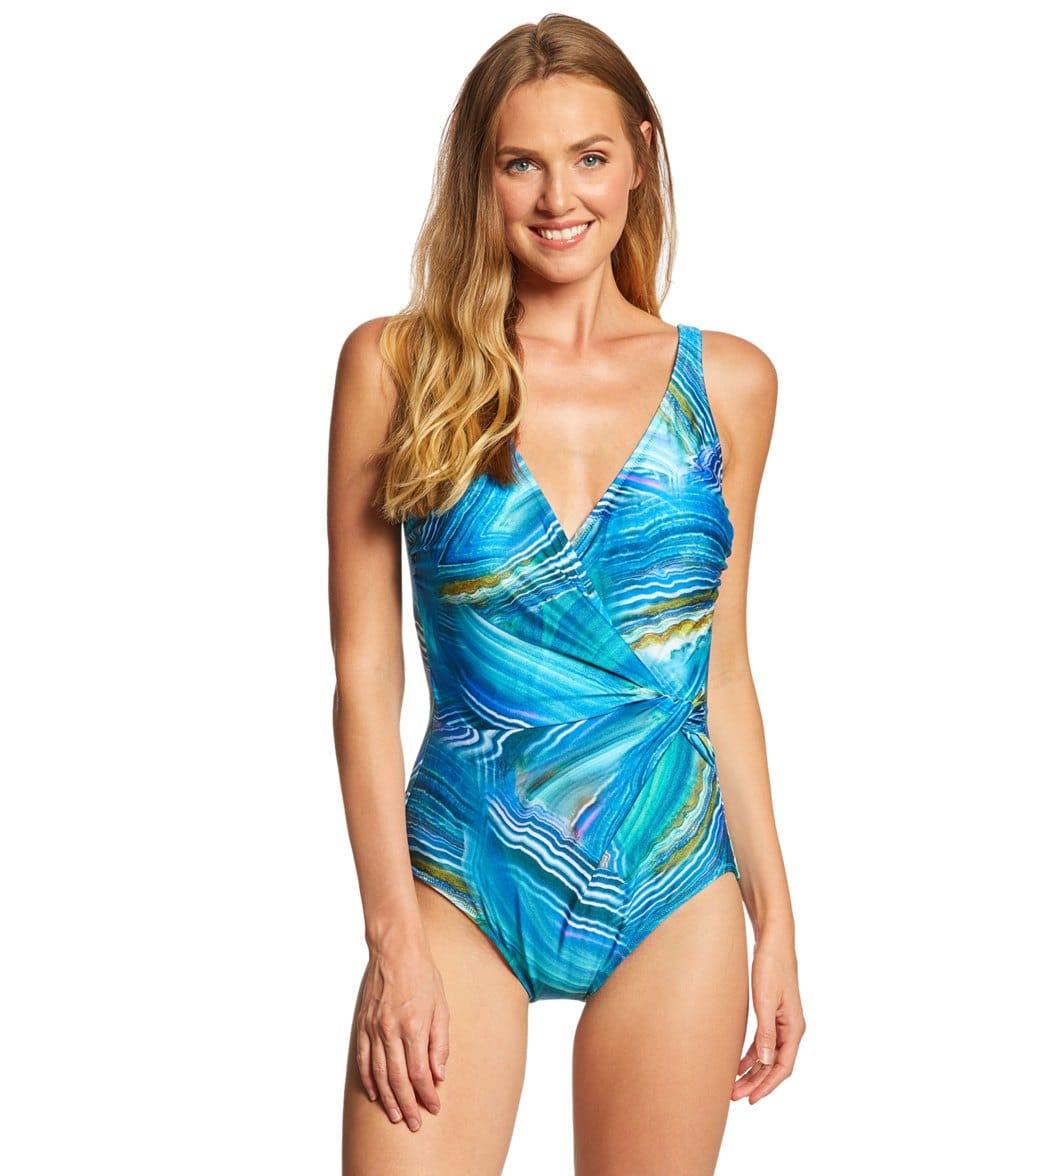 588d1fb0986526 Gottex Tourmaline Surplice One Piece Swimsuit at SwimOutlet.com - Free  Shipping